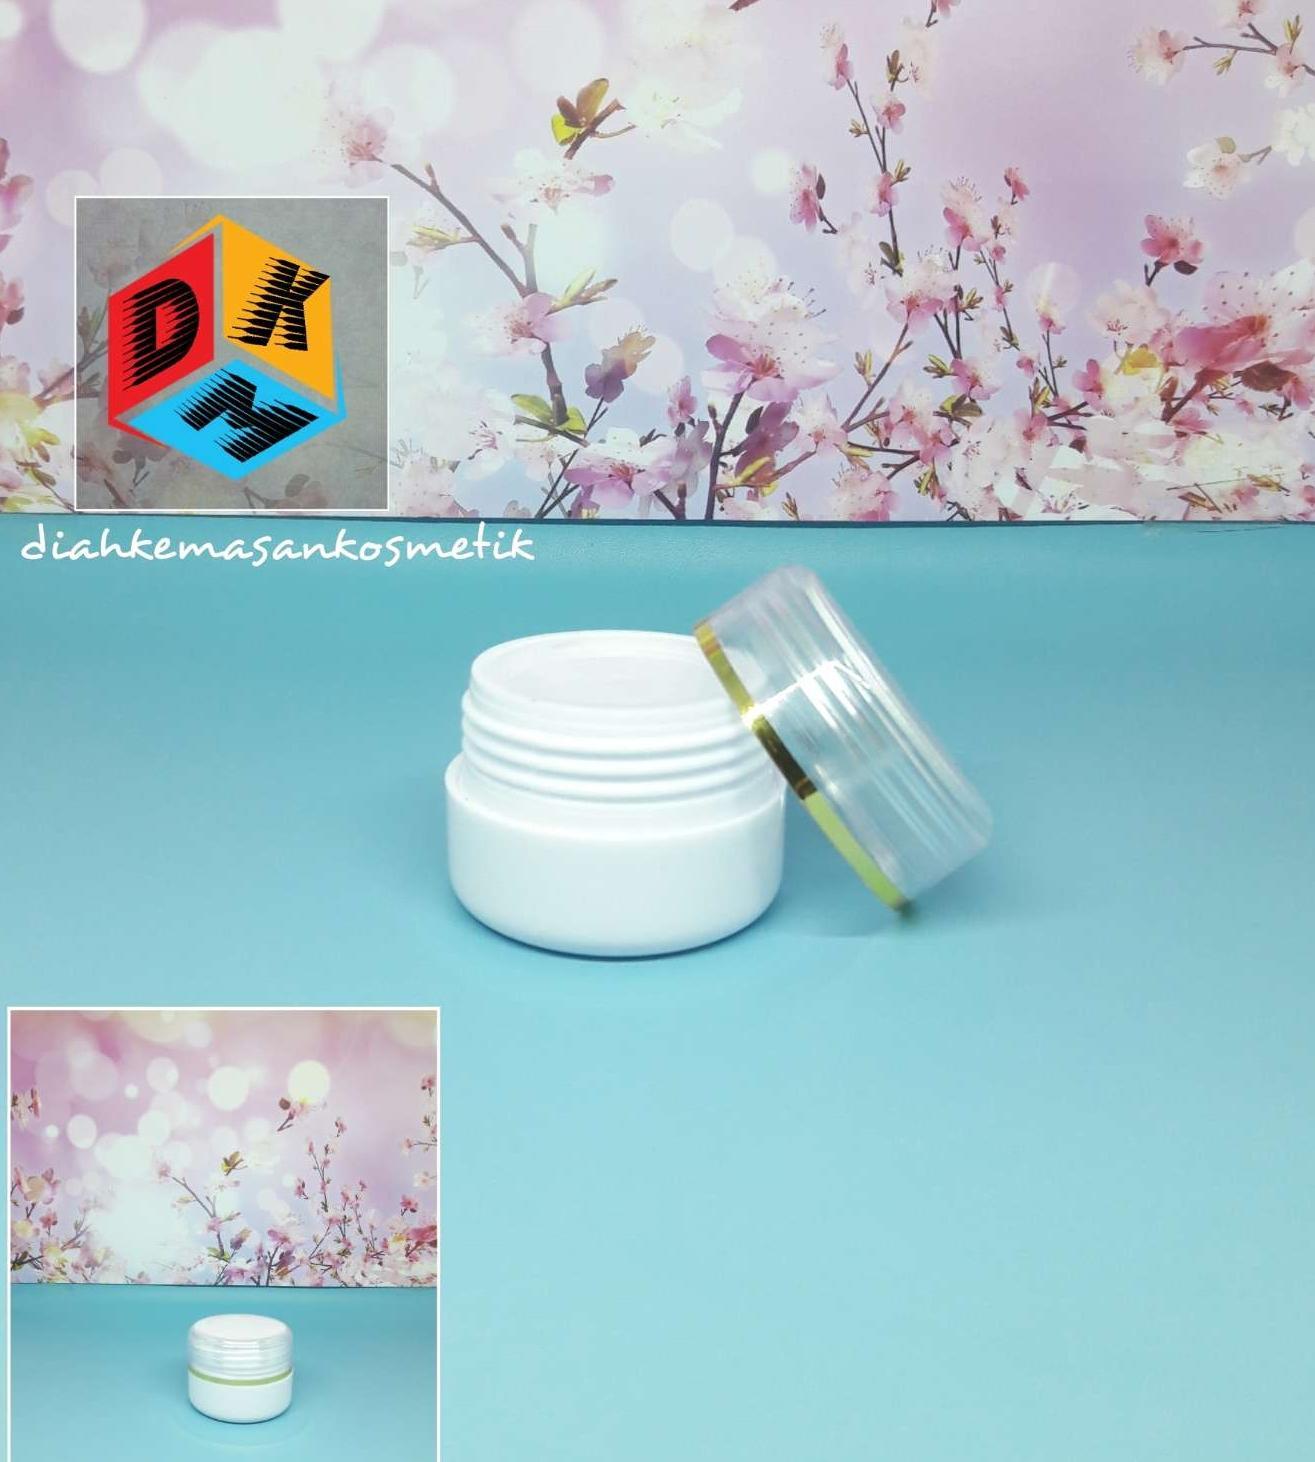 Jirifarm Hidroponik 3 Set Pot Plastik 180029 Diameter 14 Cm X Tinggi ... 5ae8494b02